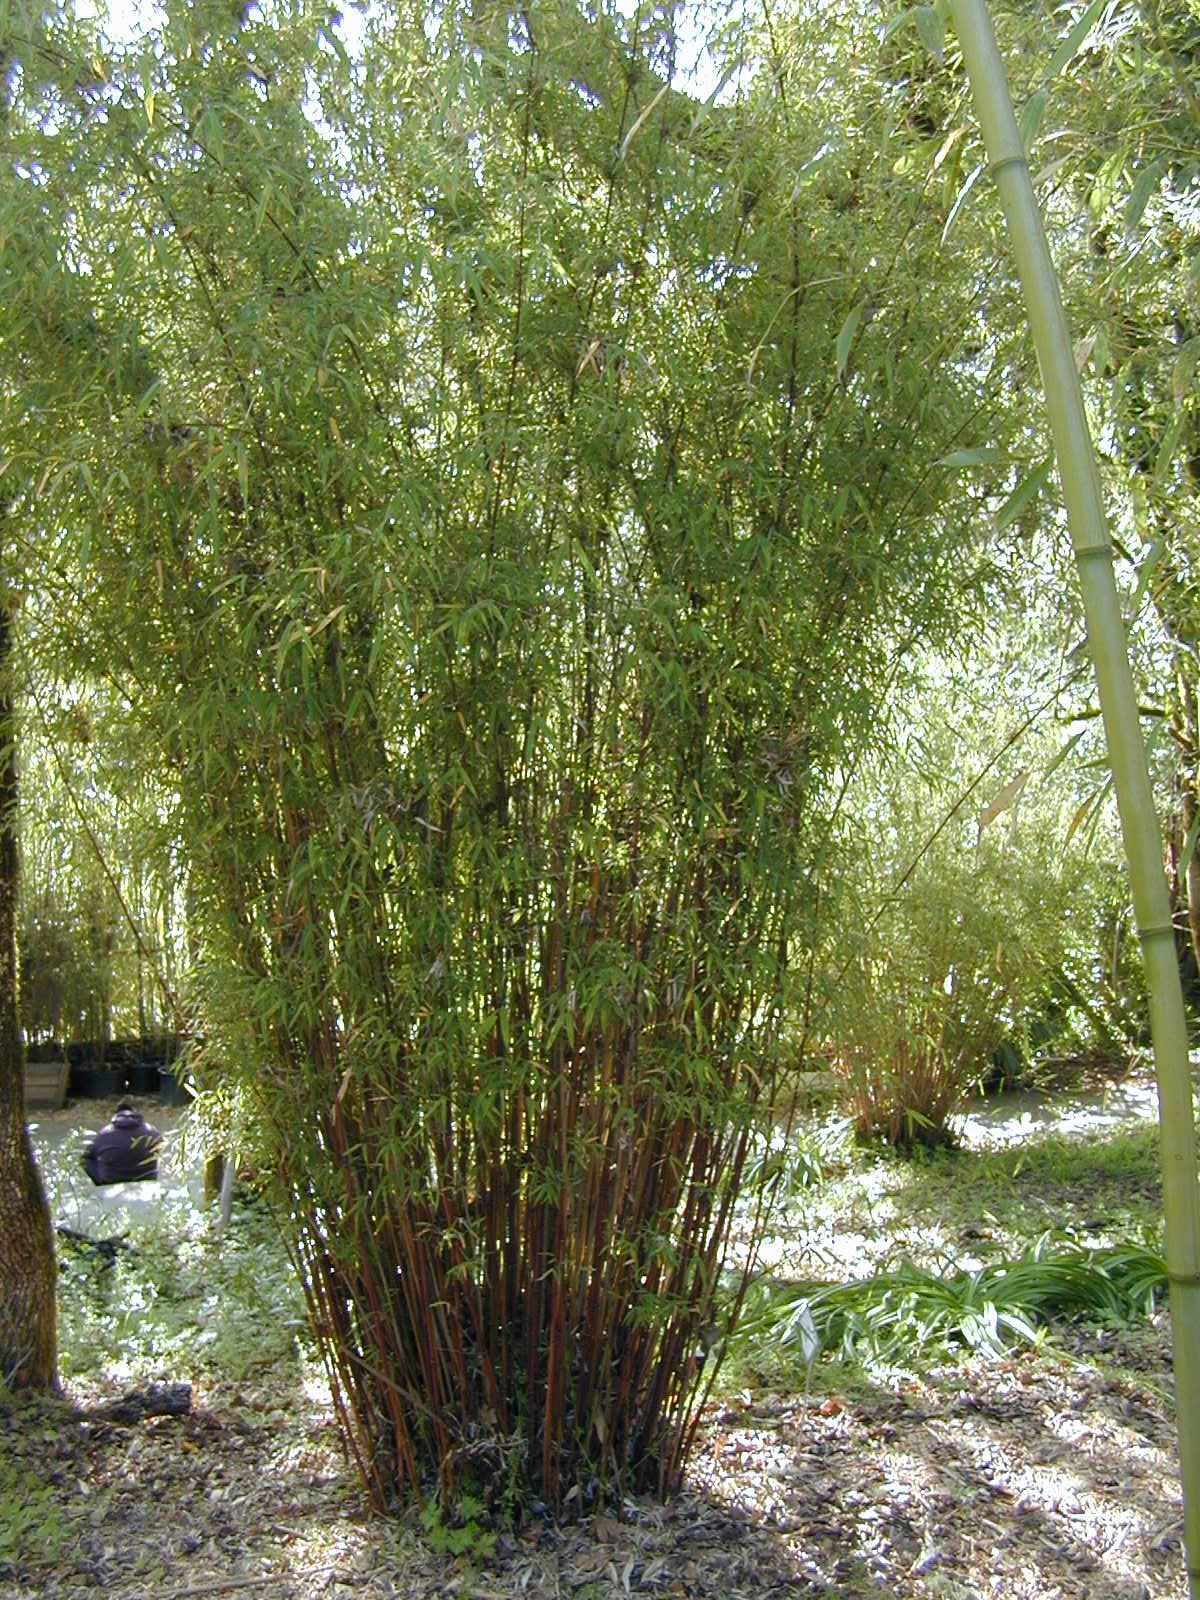 Himalayacalamus planatus (formerly Himalayacalamus asper)